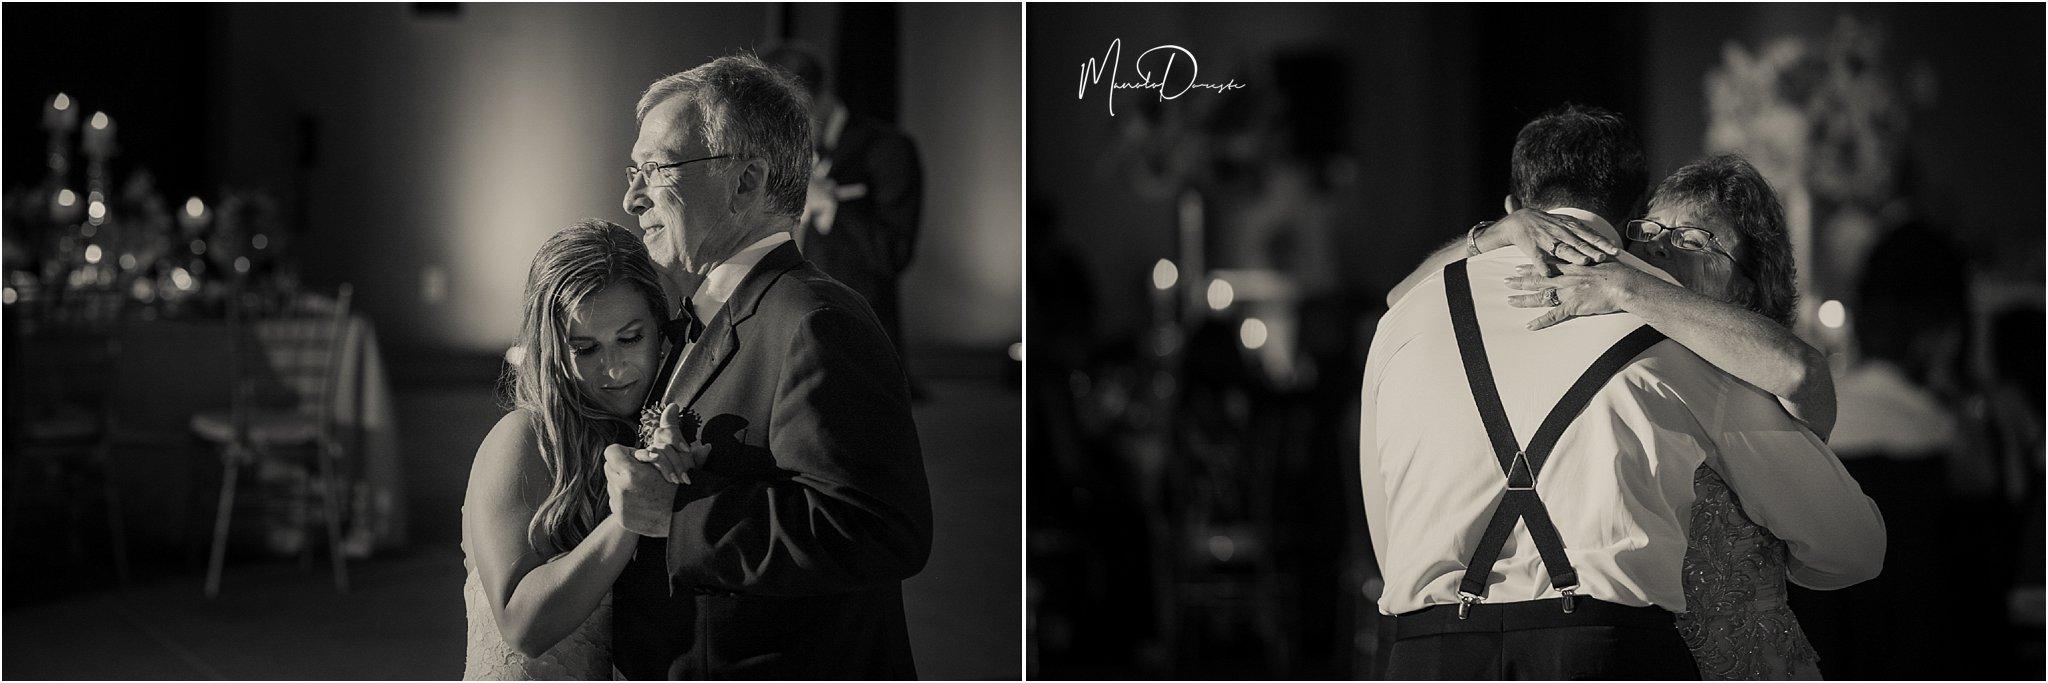 0679_ManoloDoreste_InFocusStudios_Wedding_Family_Photography_Miami_MiamiPhotographer.jpg